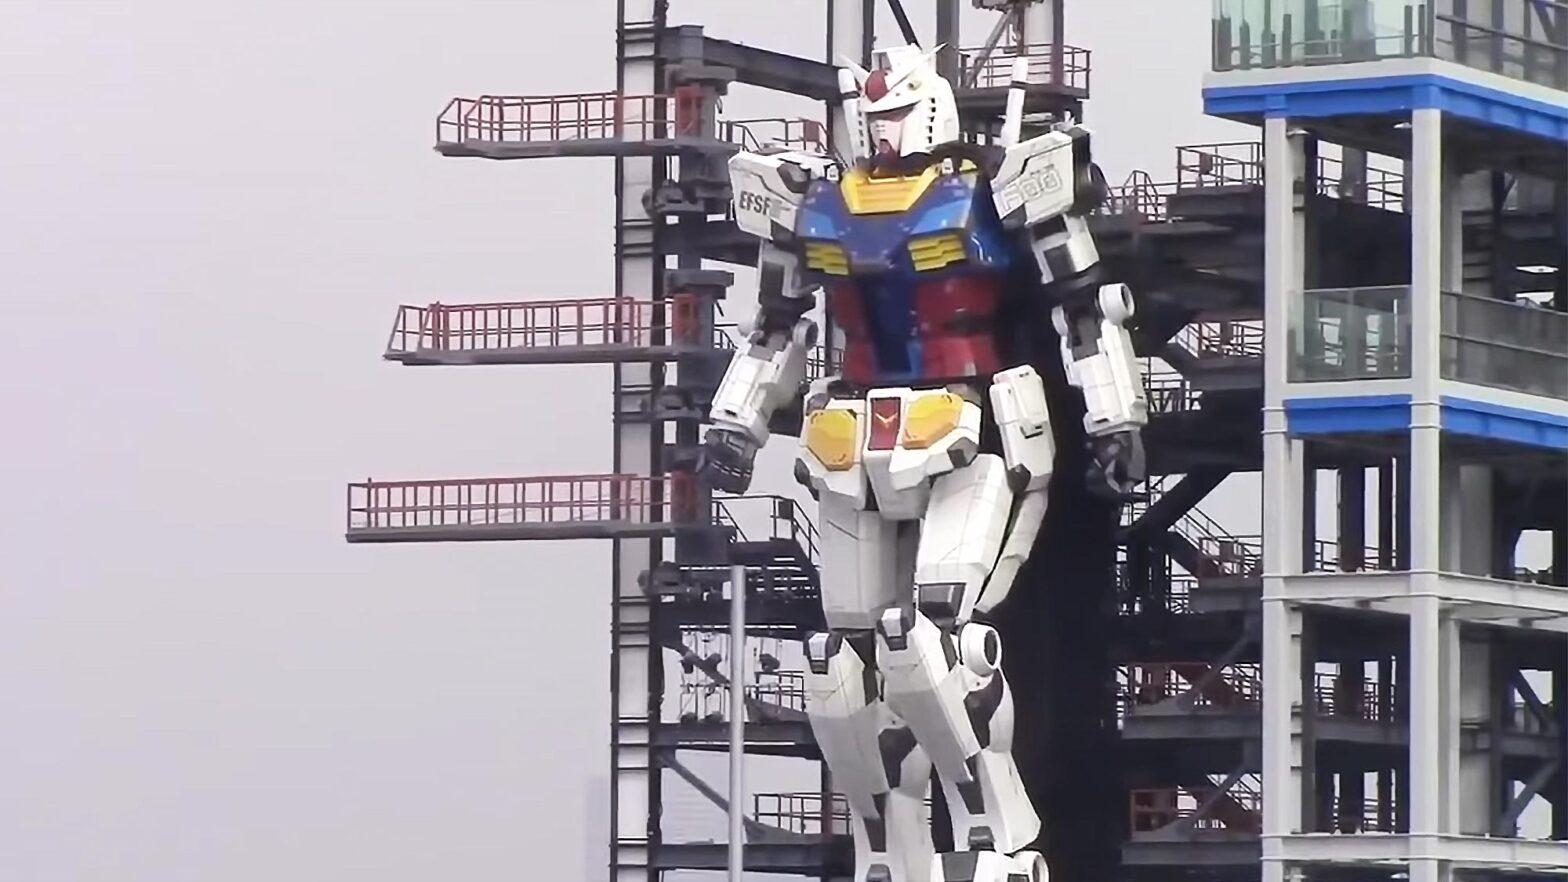 Life Size Gundam Walks And Kneel Down